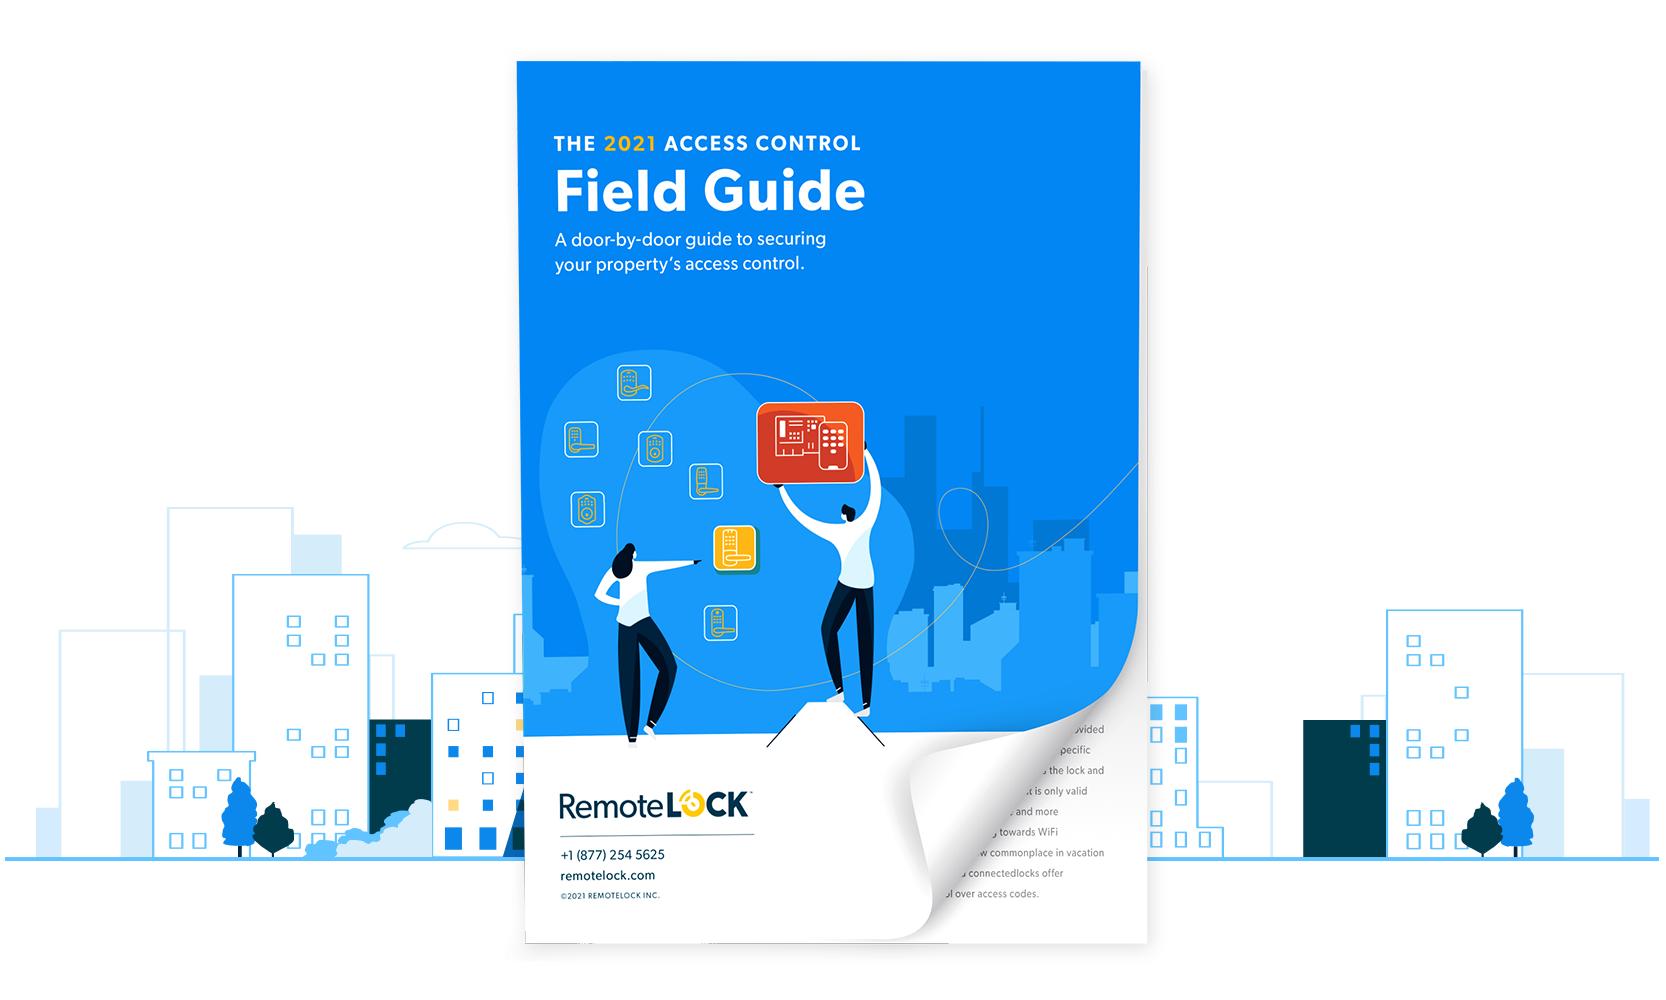 access-control-field-guide-landscape